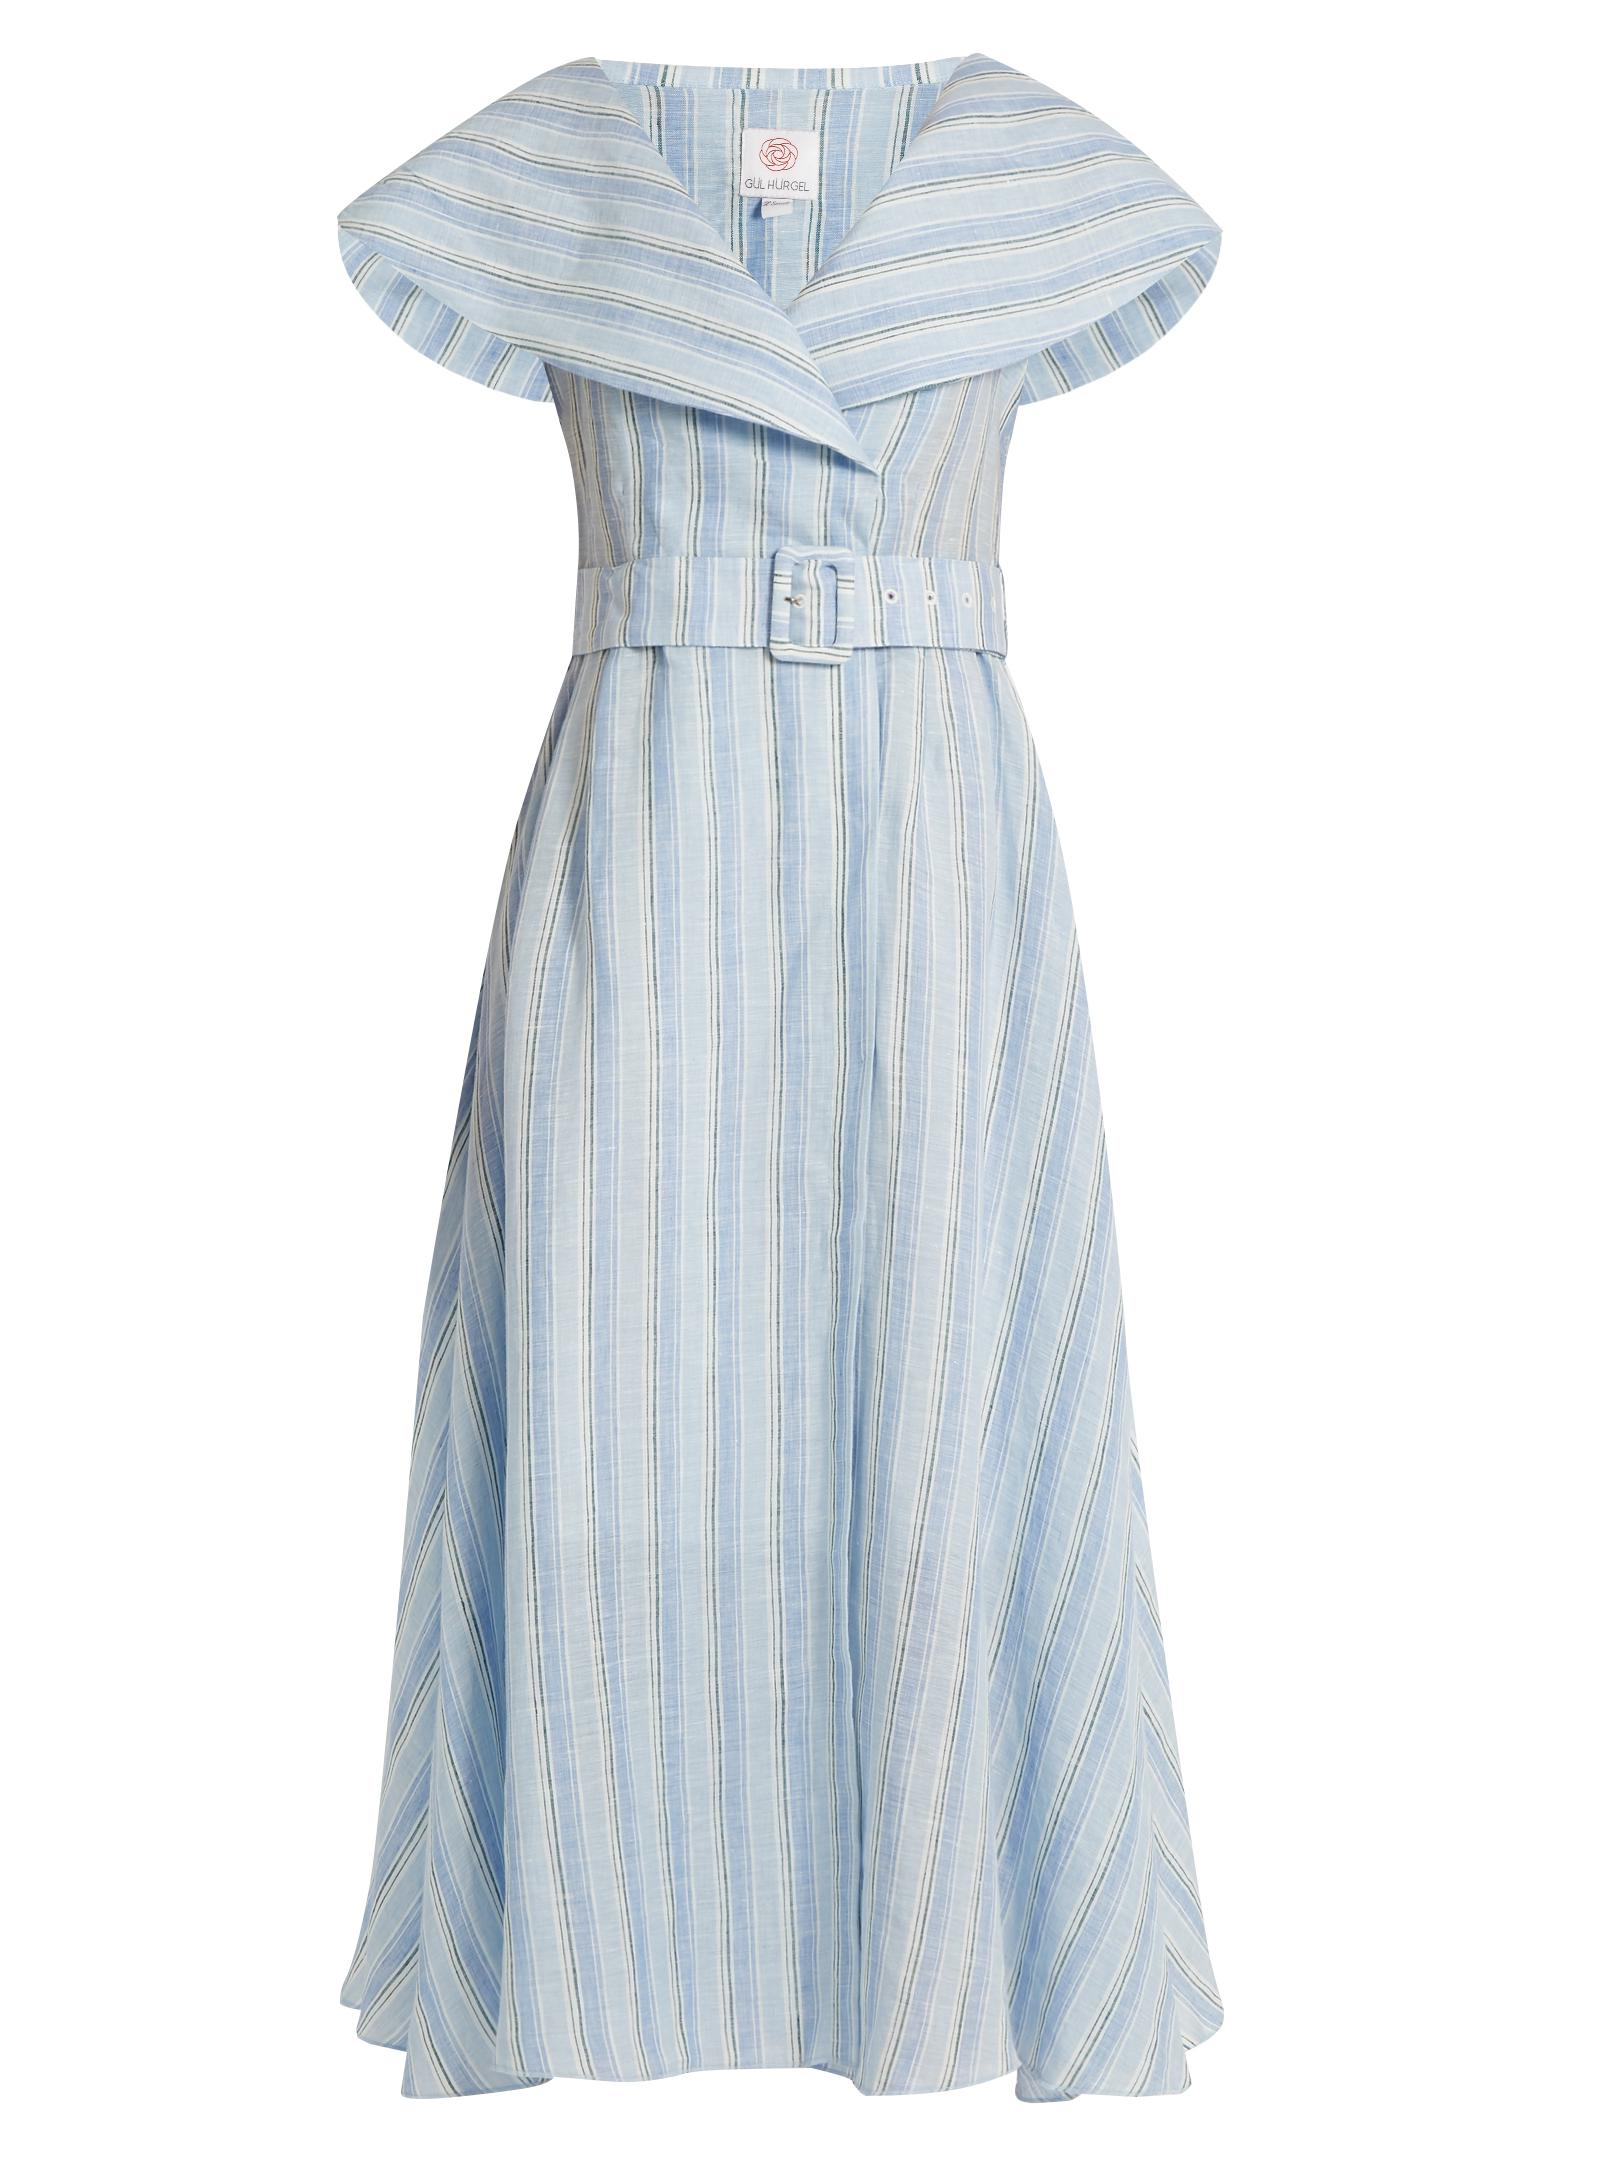 5cbcc743 Gül Hürgel V-neck Sailor-collar Striped-linen Dress in Blue - Lyst